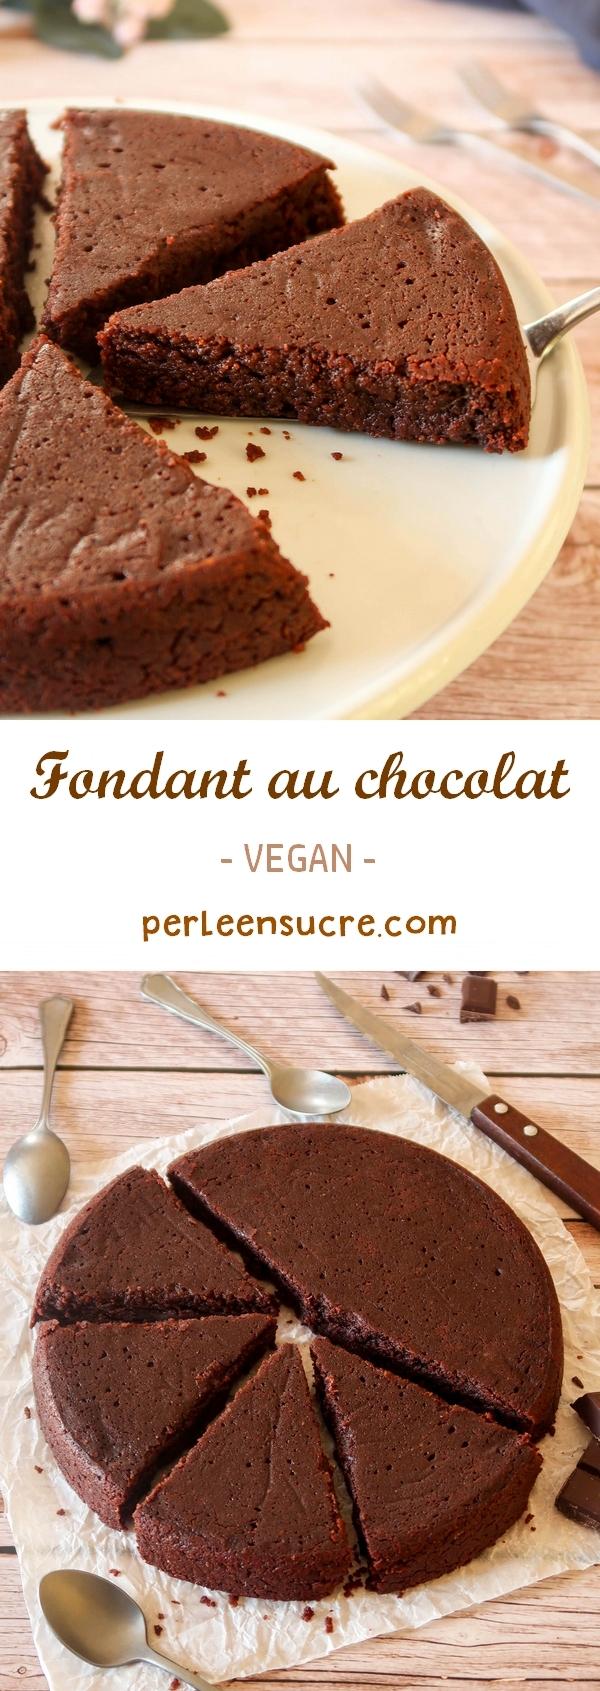 Fondant au chocolat vegan pinterest